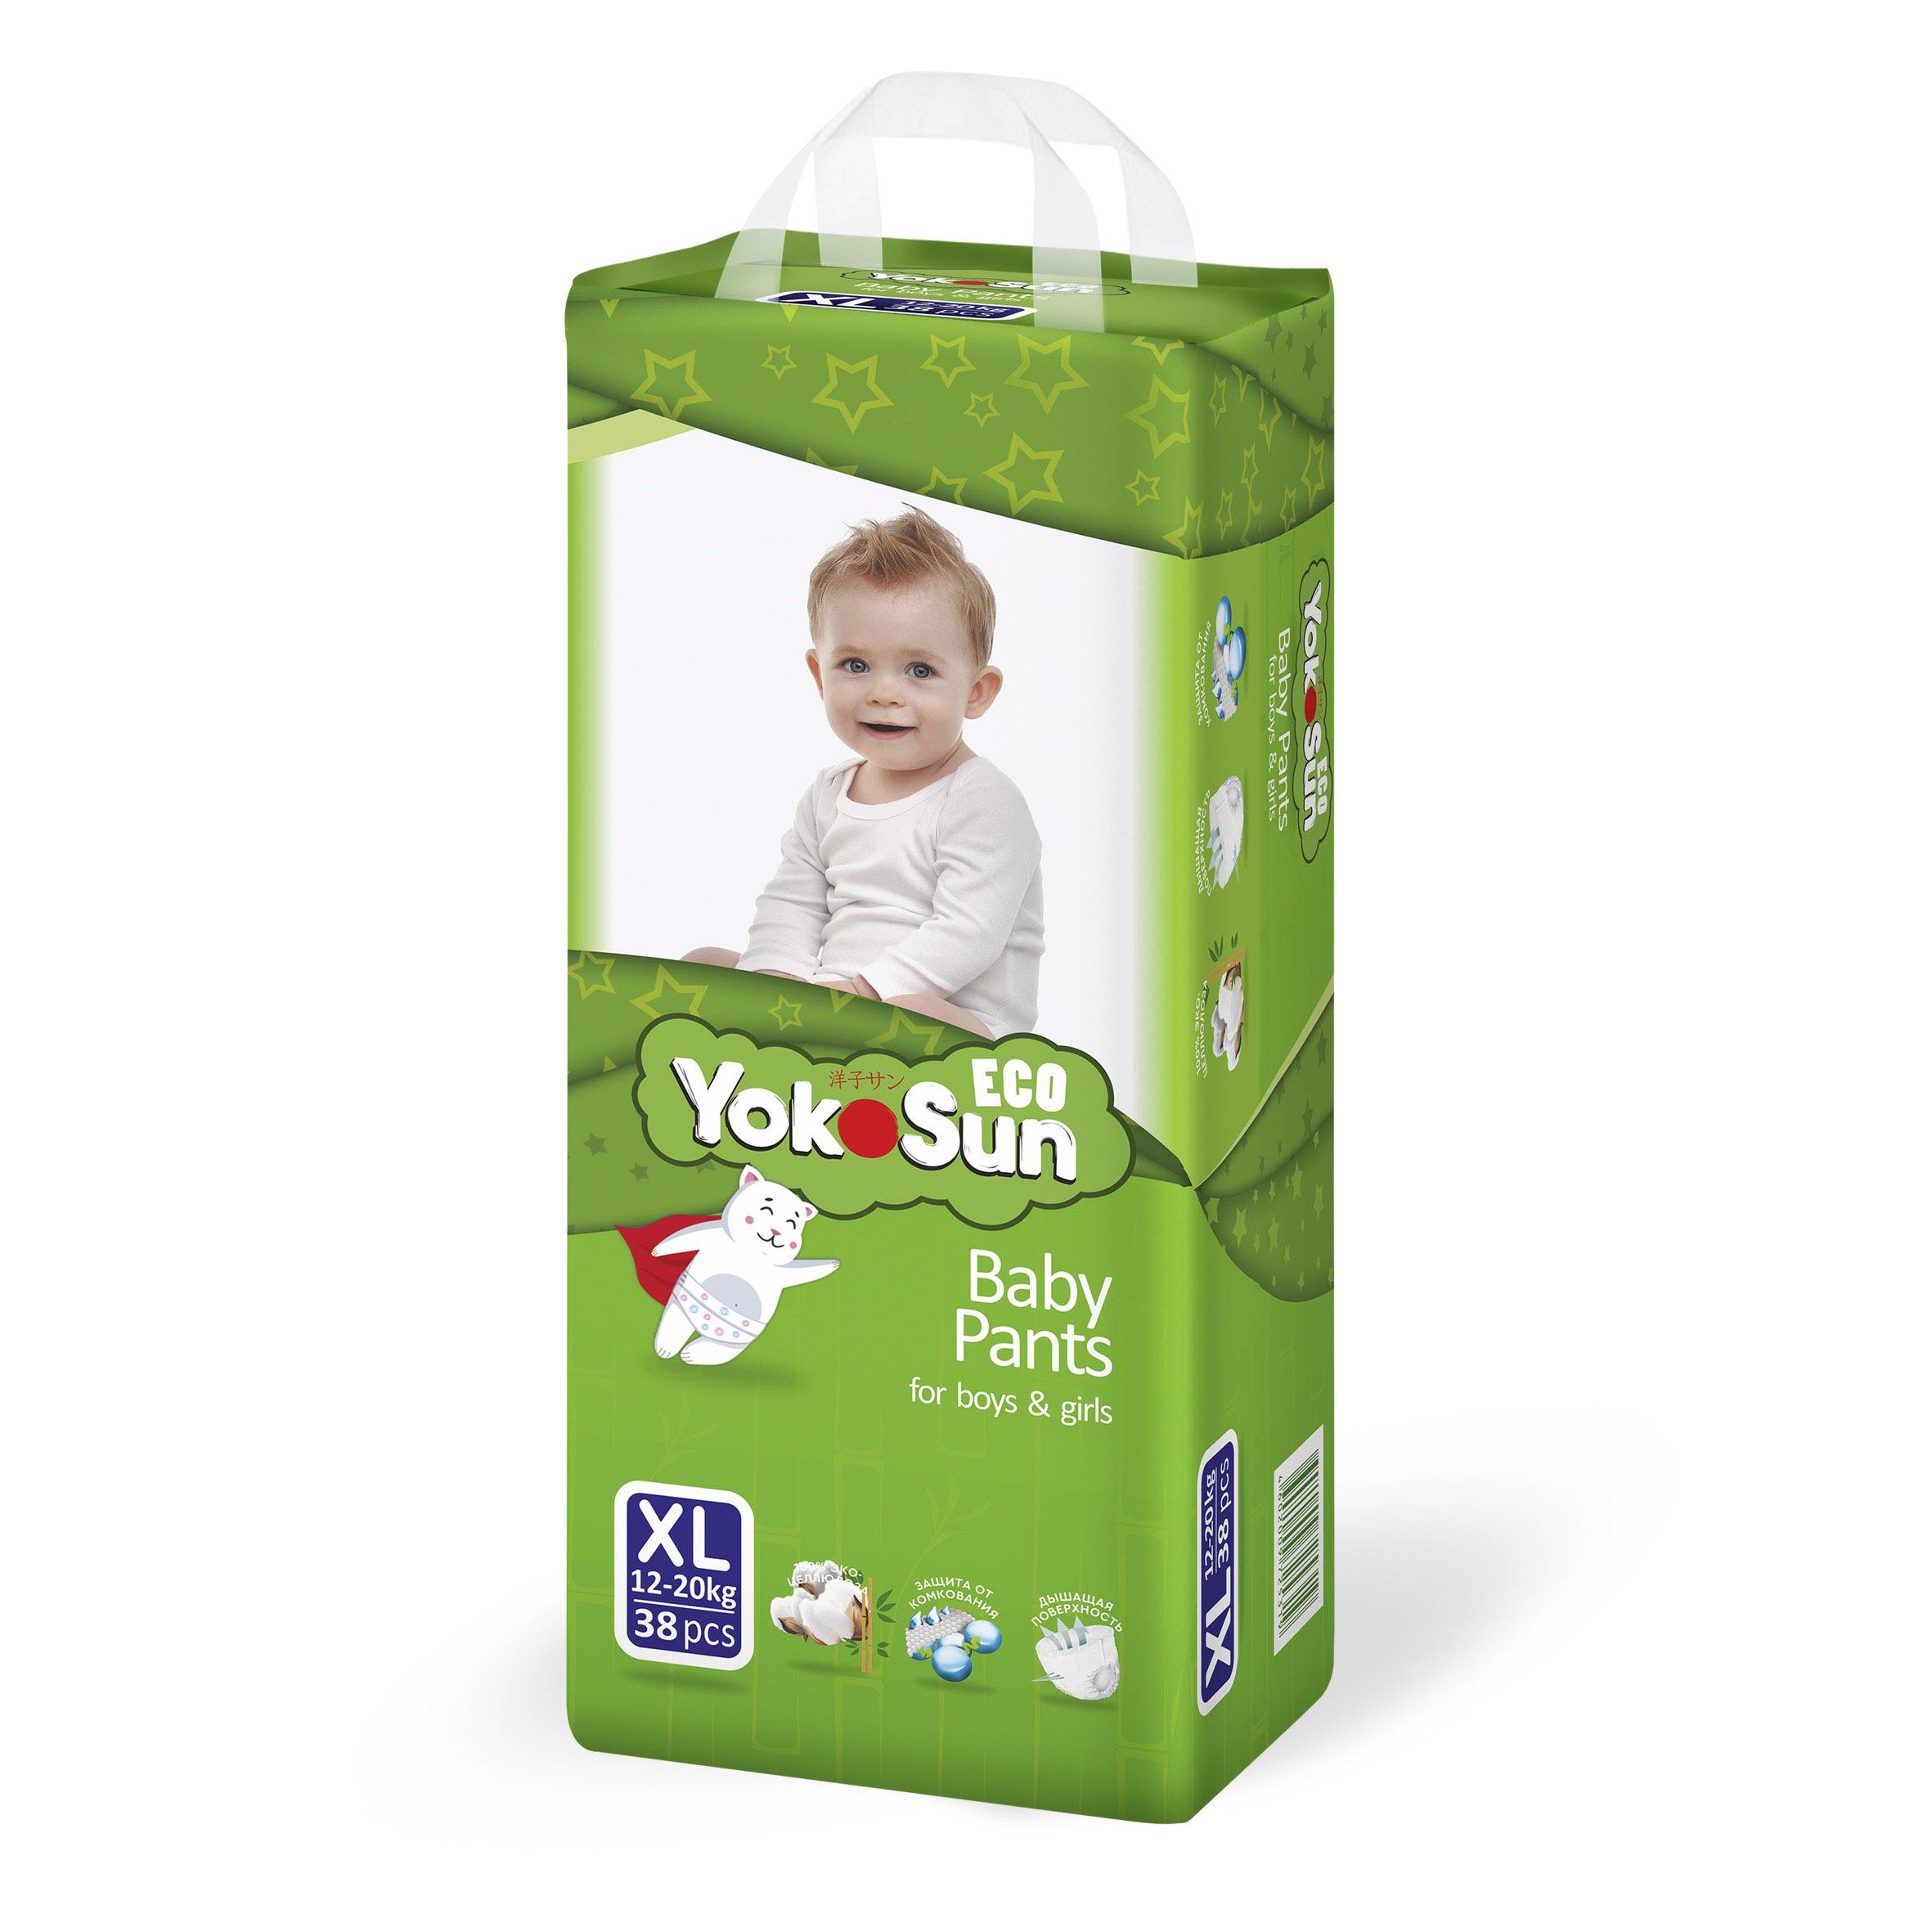 Фото - Подгузники-трусики YokoSun Eco XL (12-20 кг) 38 шт yokosun трусики xl 12 20 кг 76 шт игрушка для ванной котик йоко